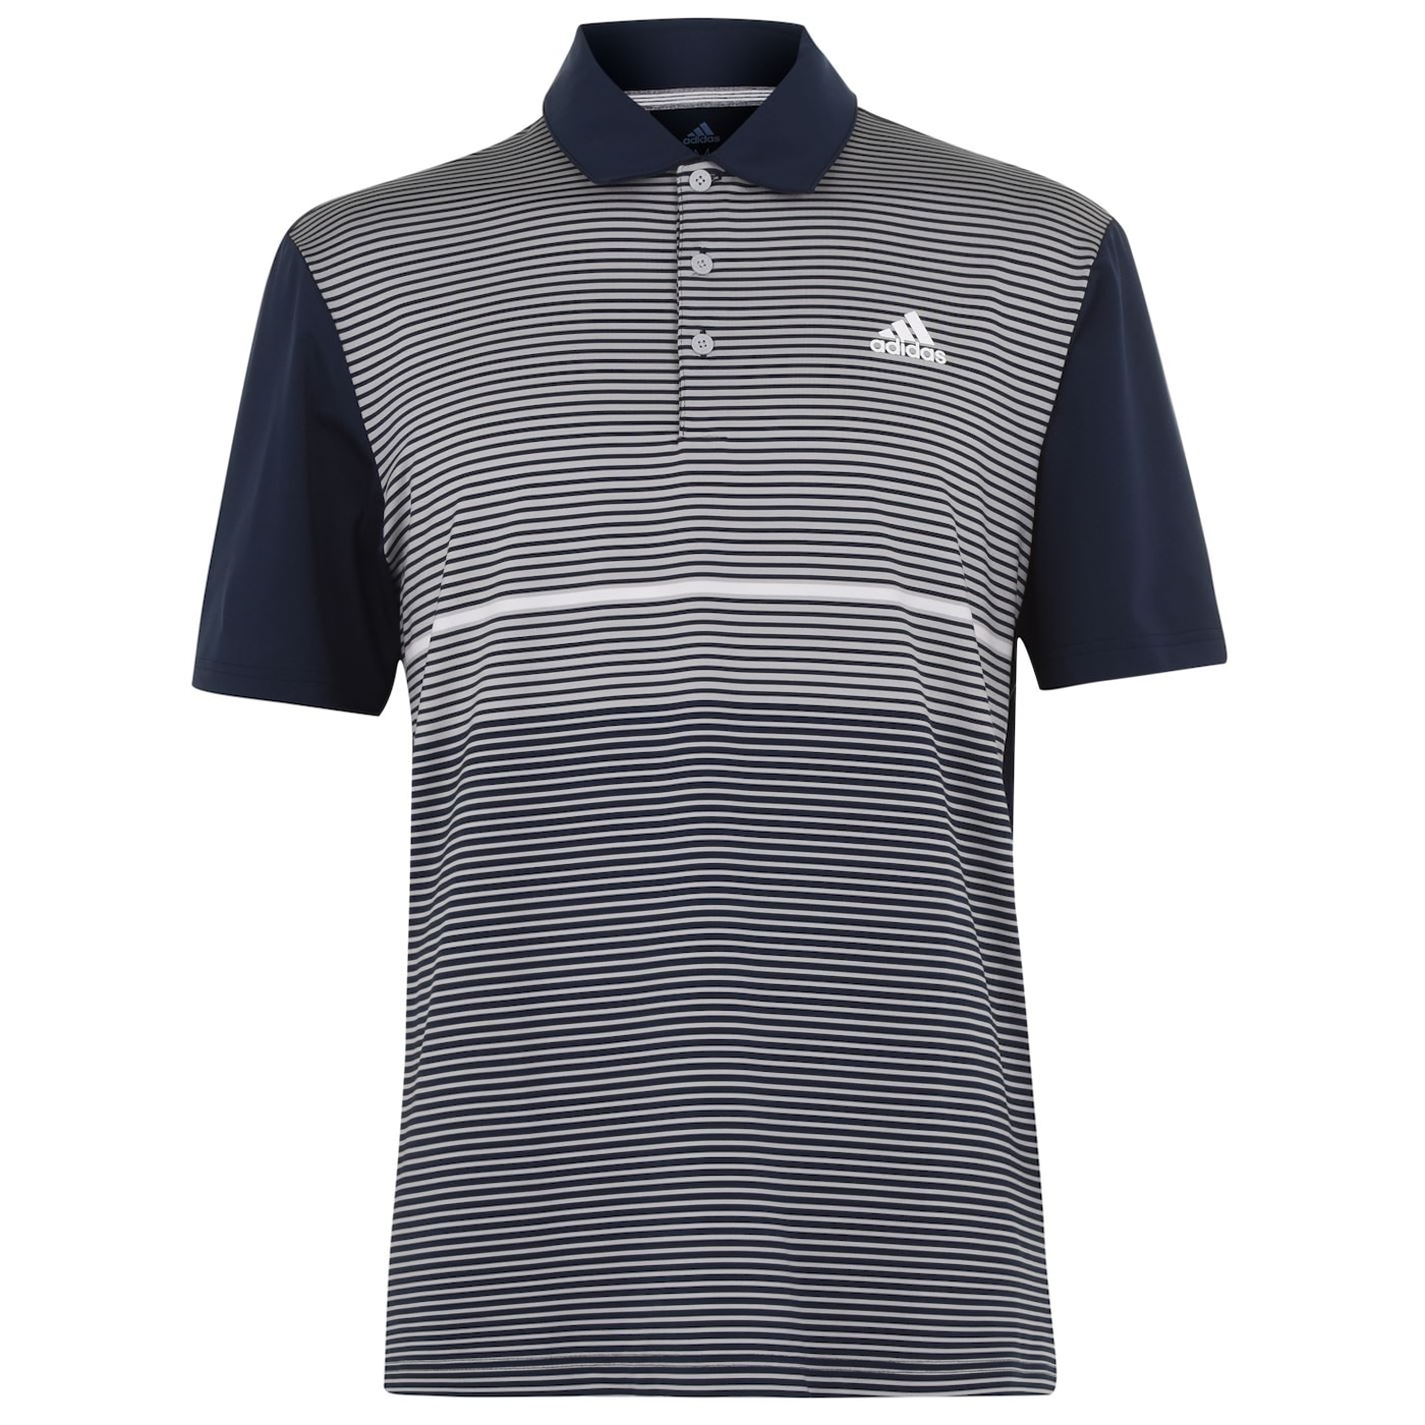 Adidas Ultimate365 Colour Block Golf Polo Shirt Mens